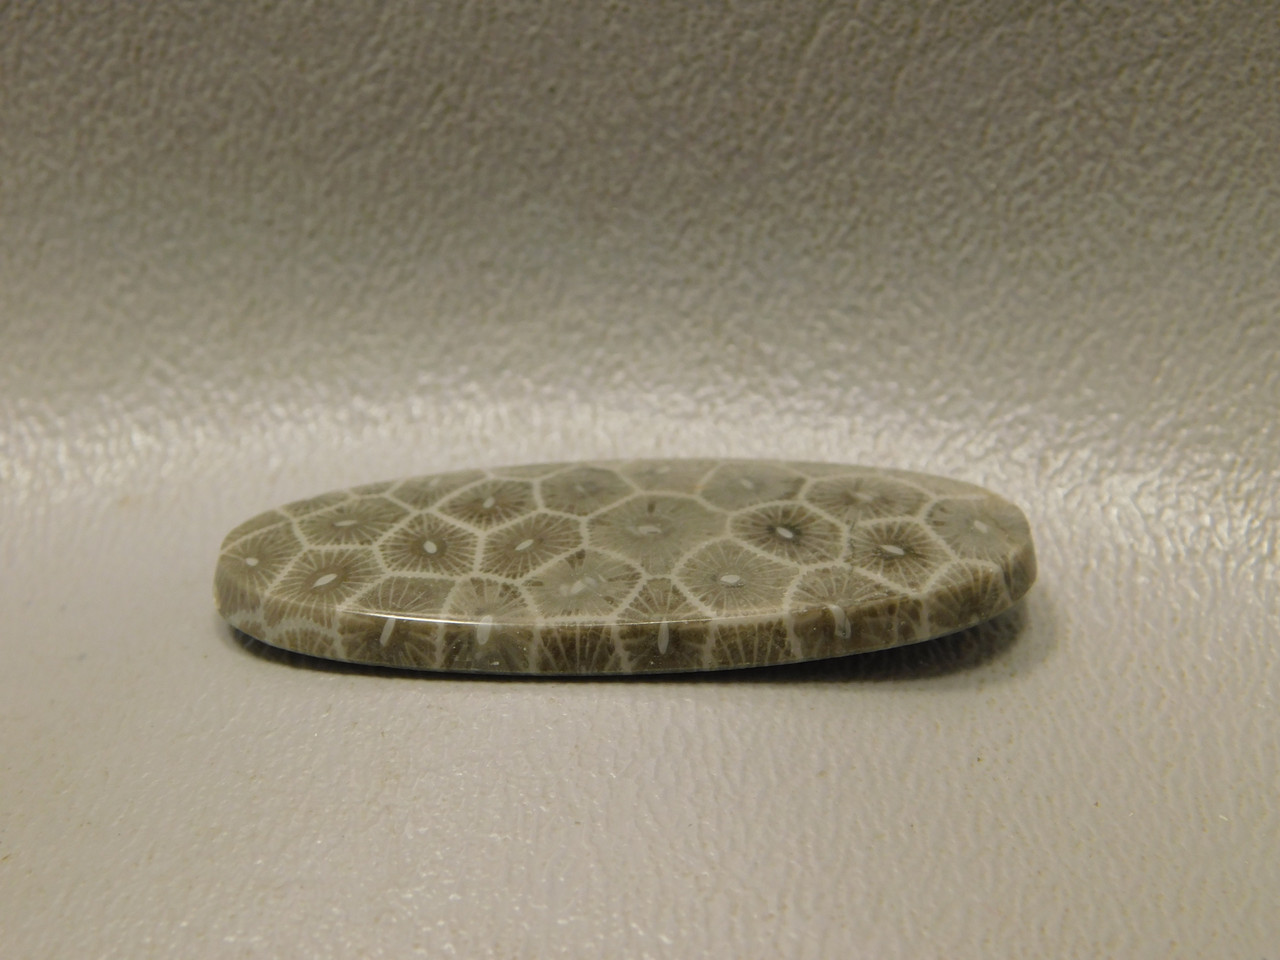 Flower Jasper Semiprecious Stone Fossil Coral Cabochon #F14